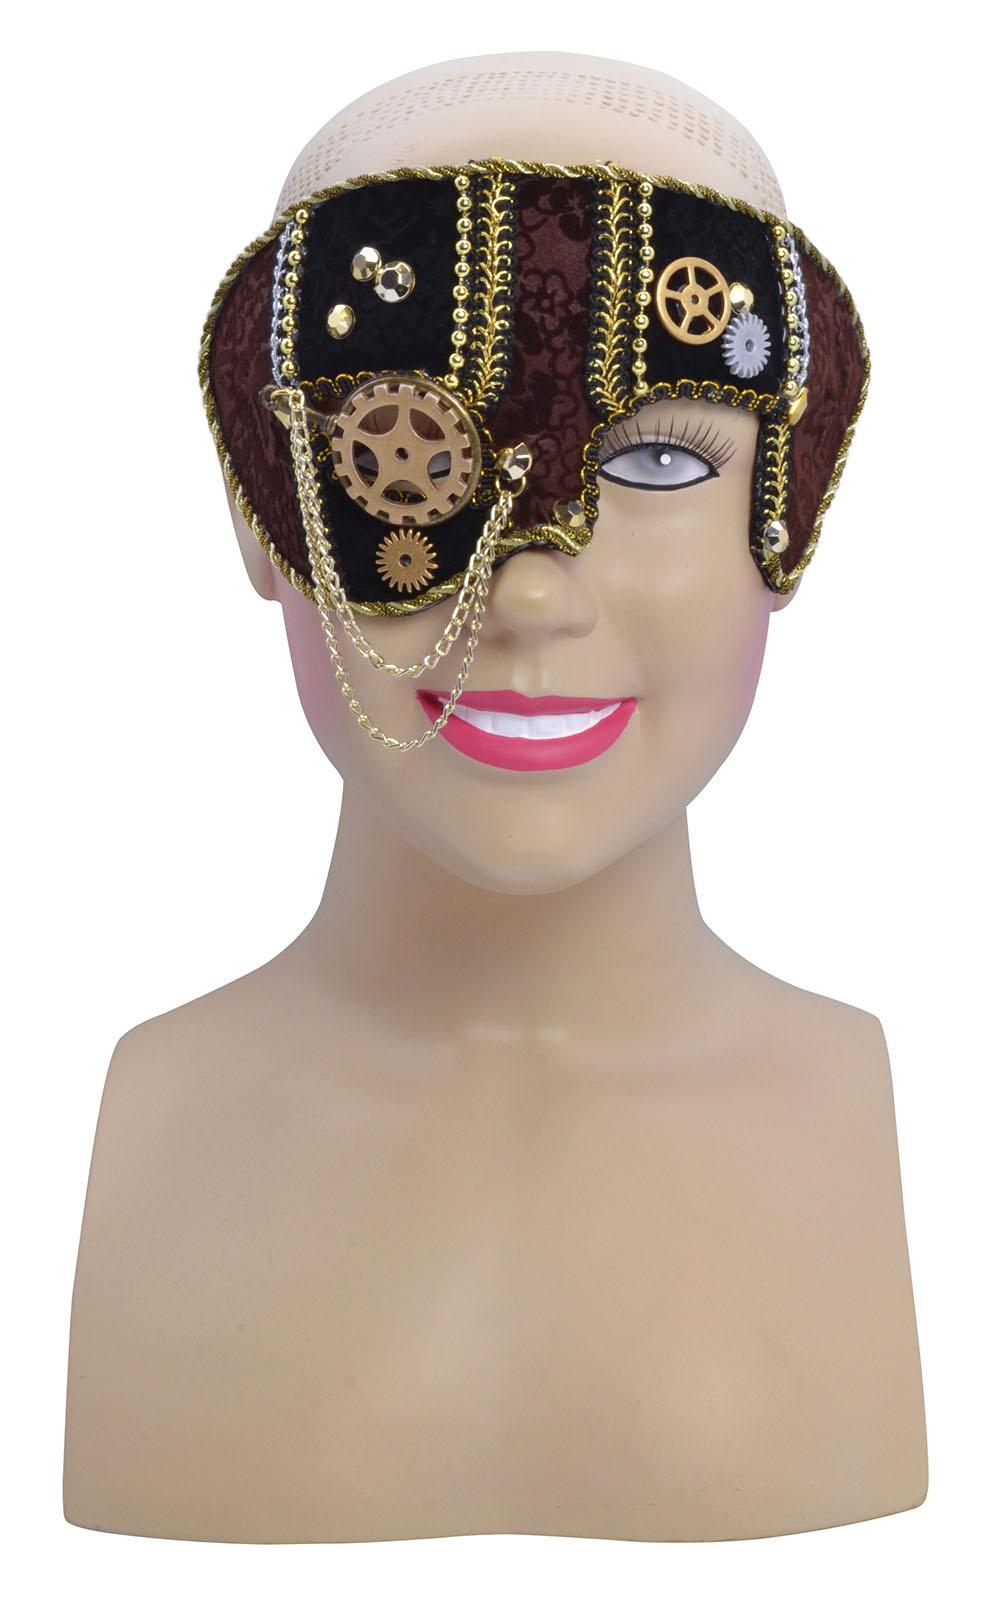 Men Male Steampunk Face Mask Masquerade Ball Party Halloween Fancy Dress